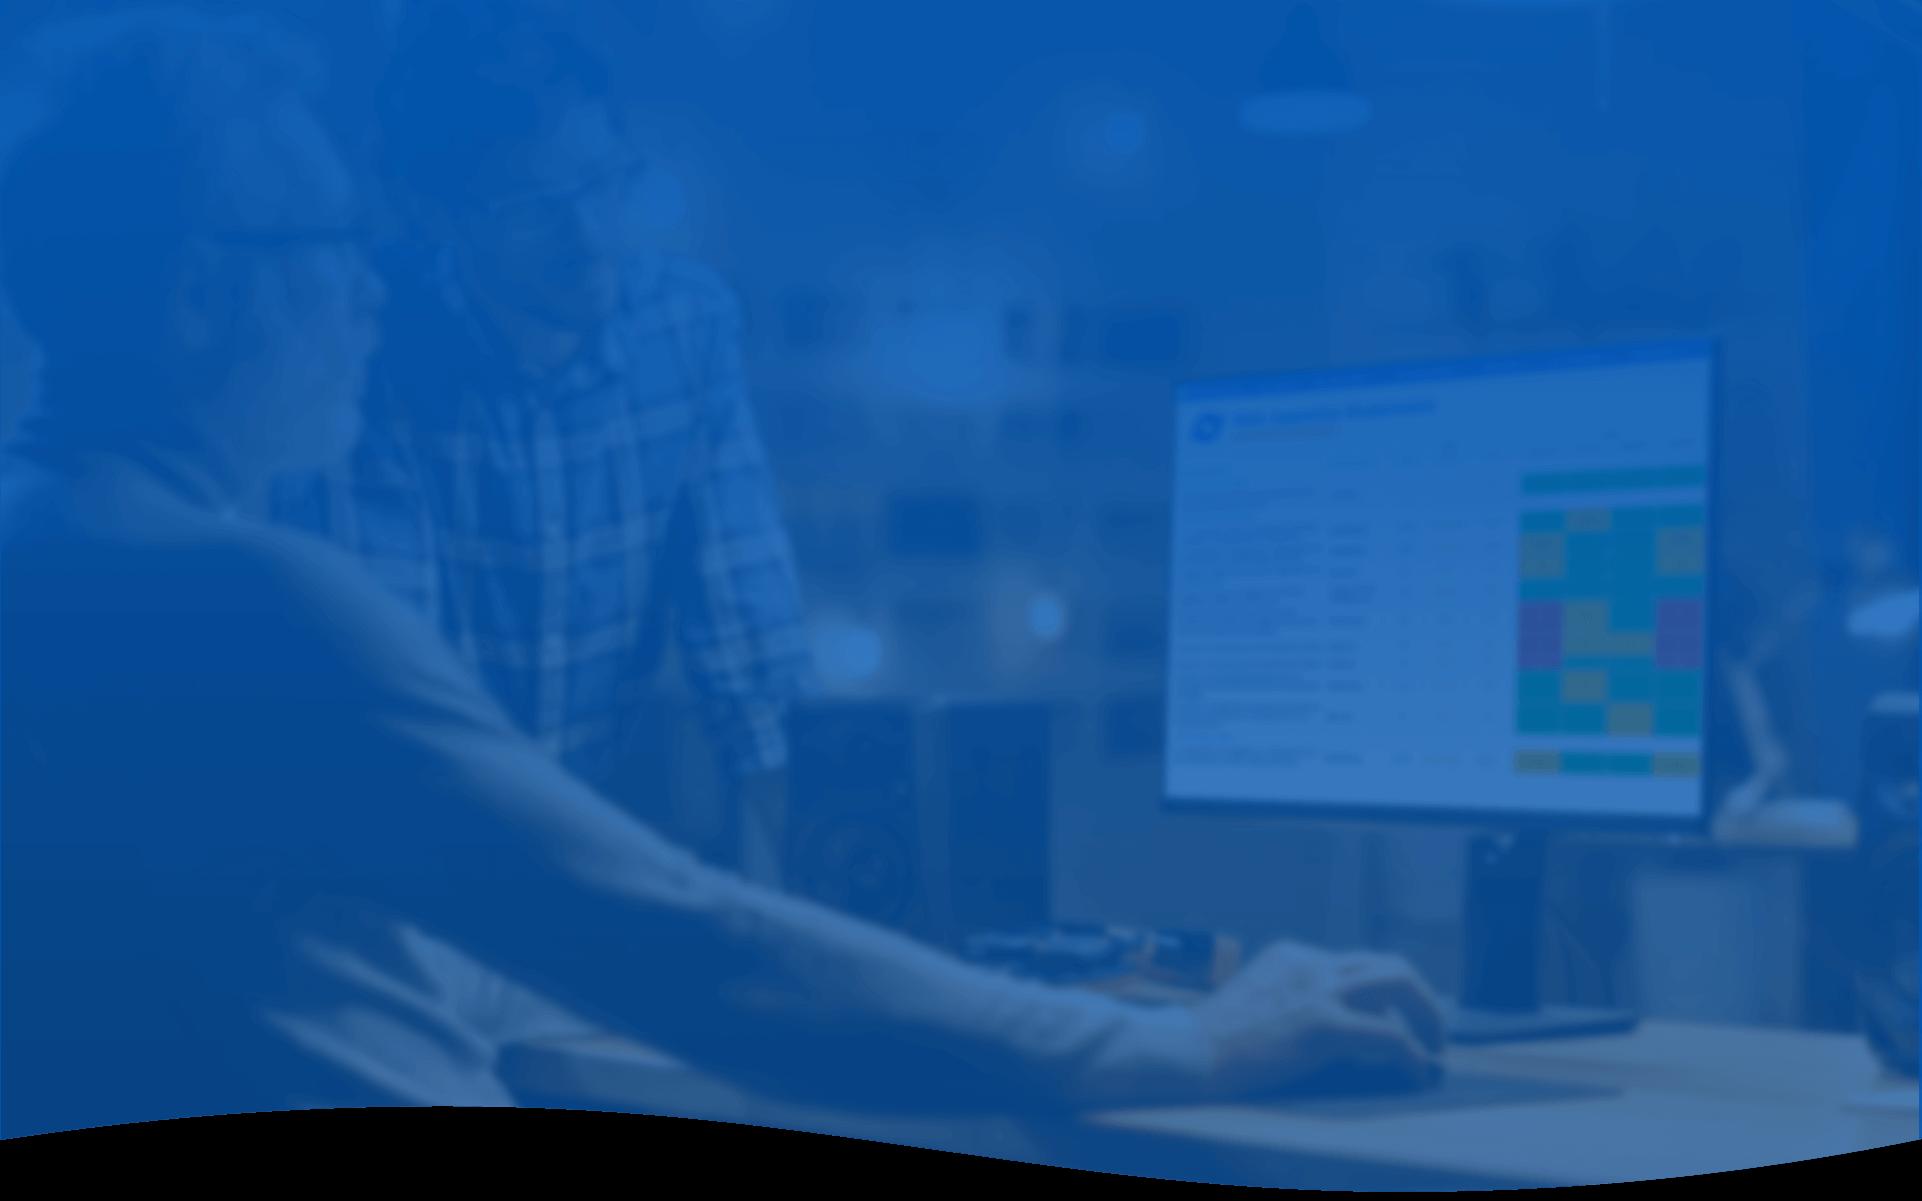 Risk-Metrics-Webinar-lp-hero-background